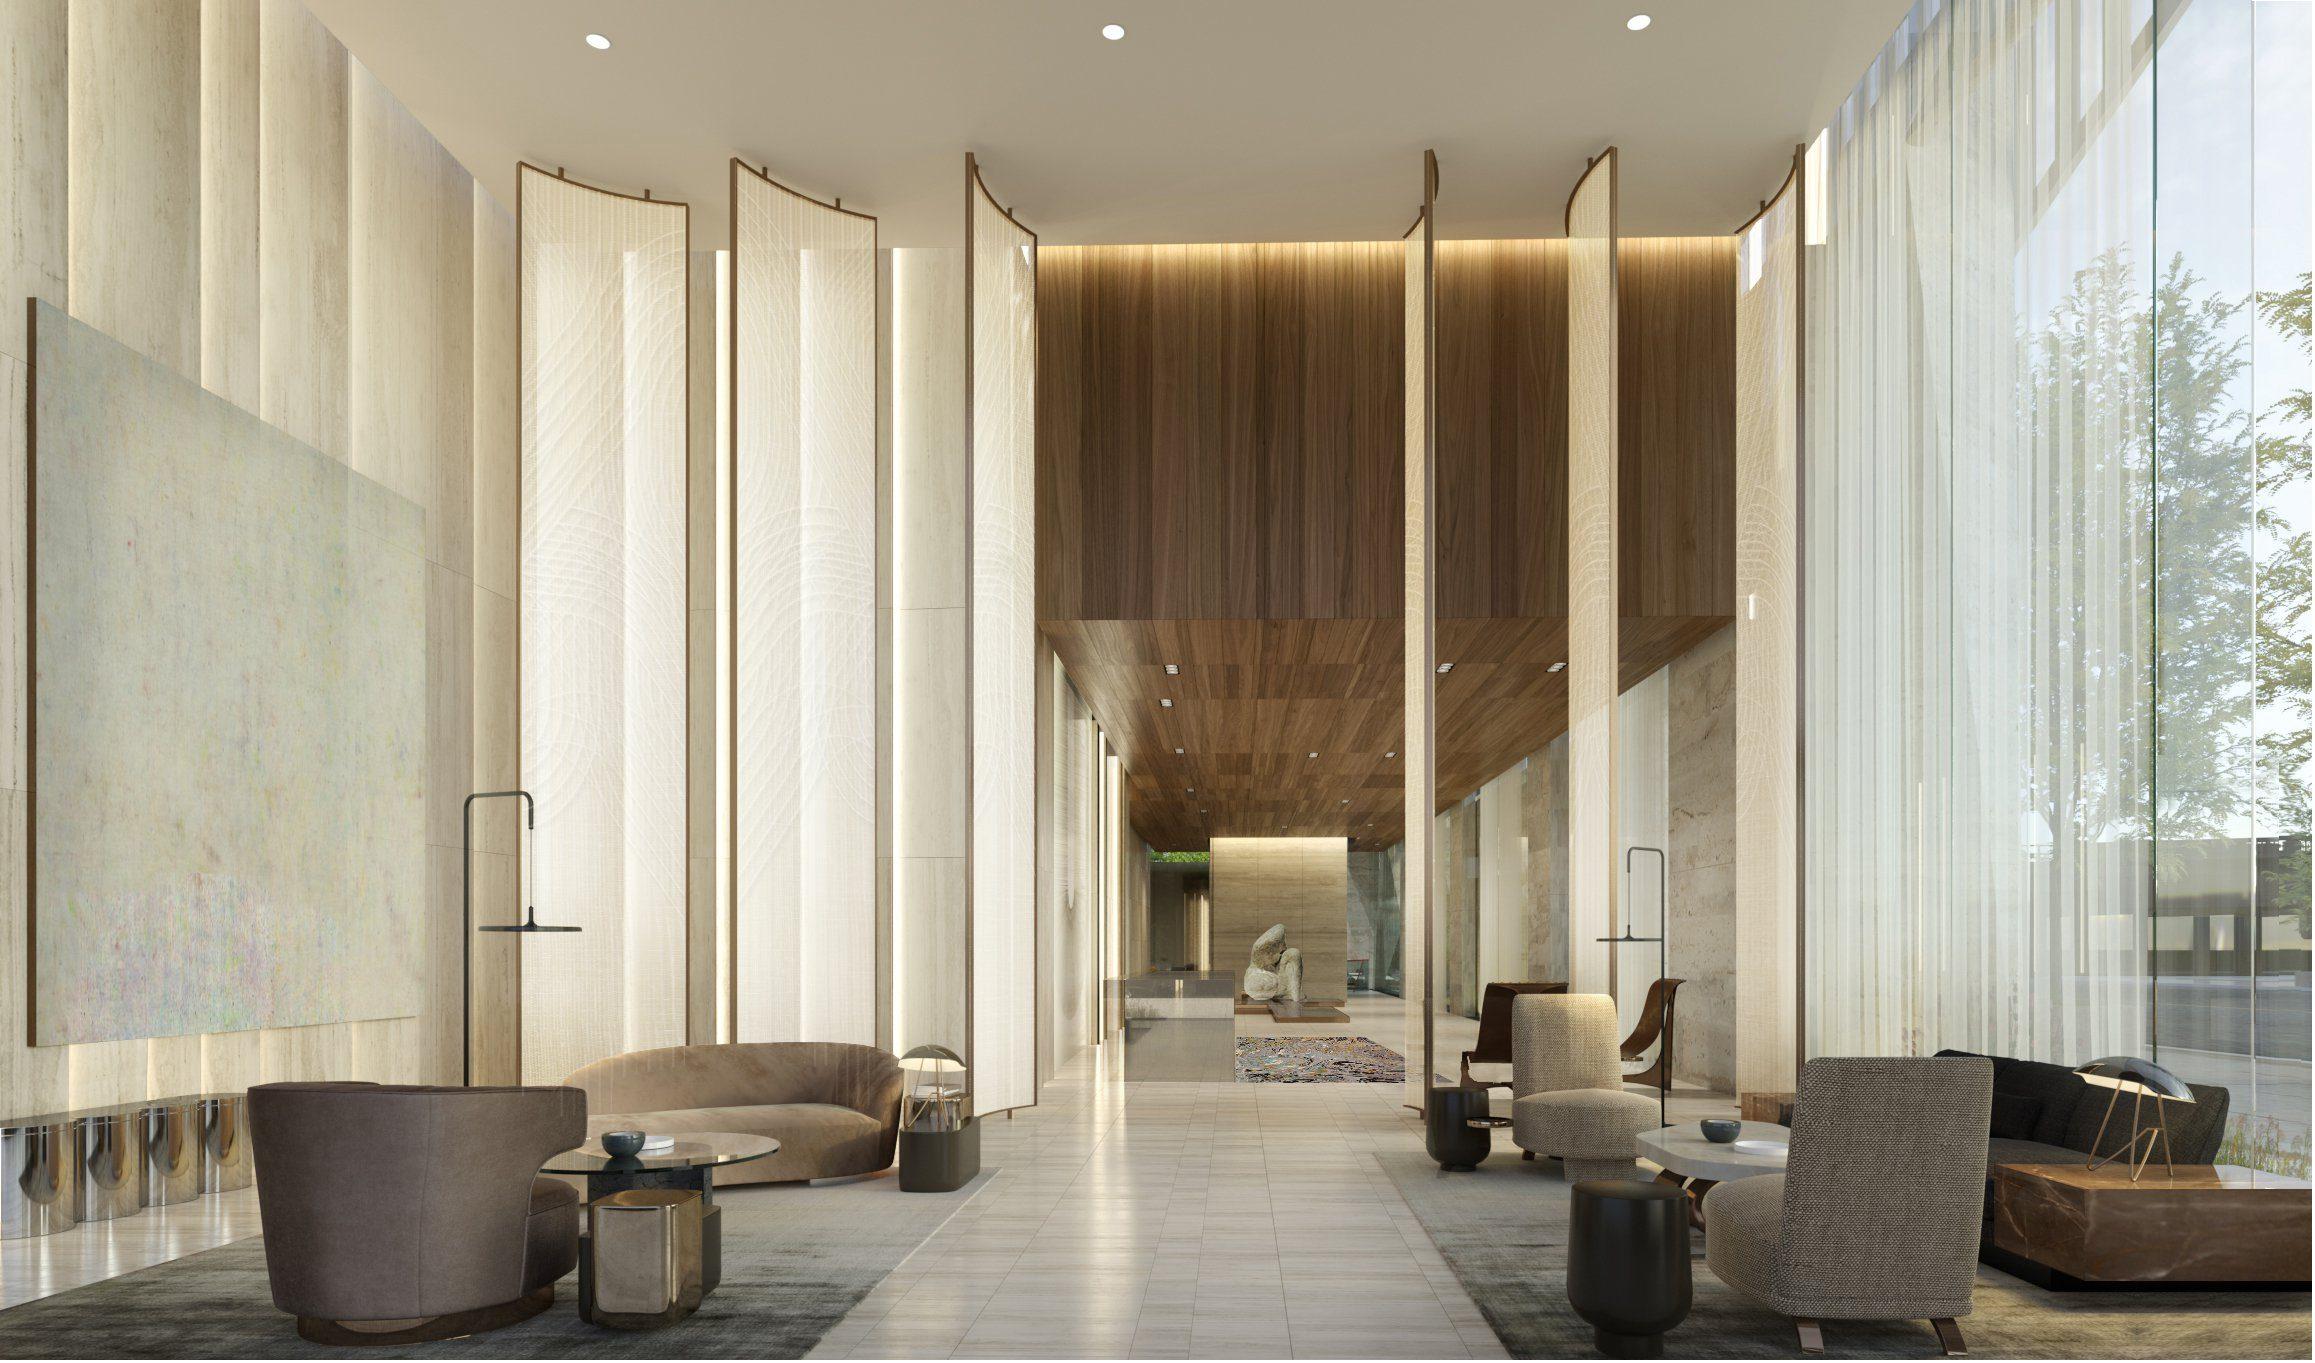 15 Hudson Yards, Diller Scofidio + Renfro, Hudson Yards construction